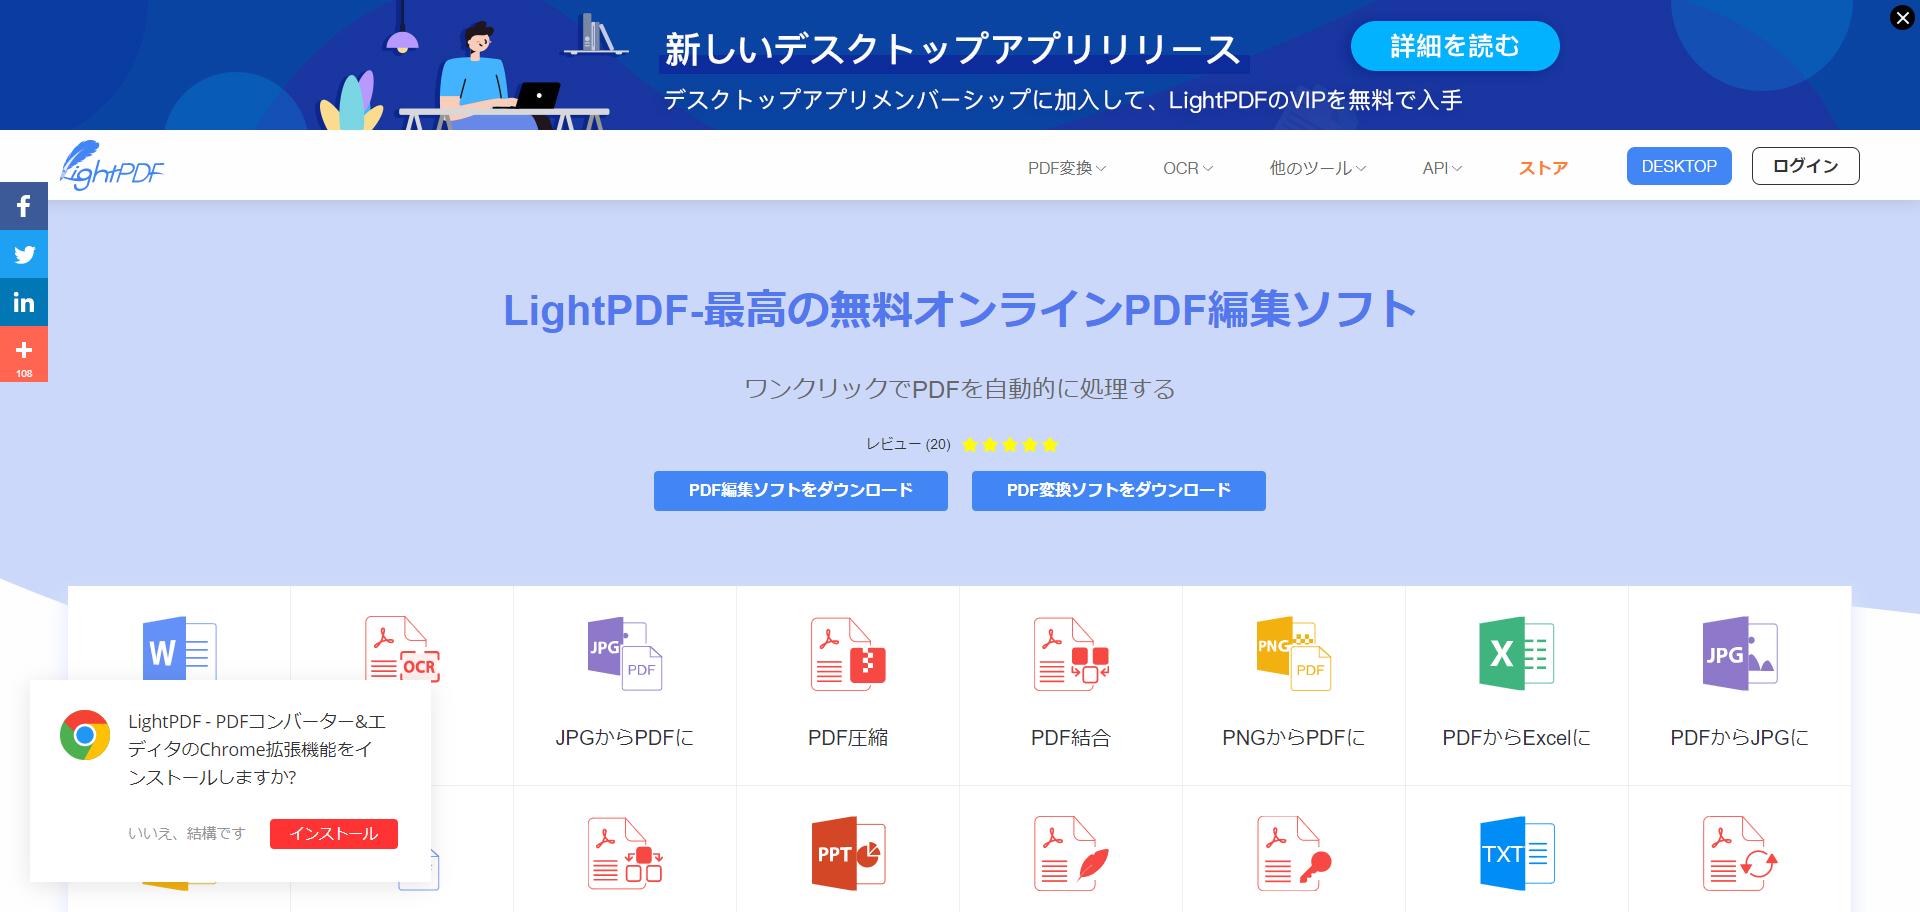 LightPDF